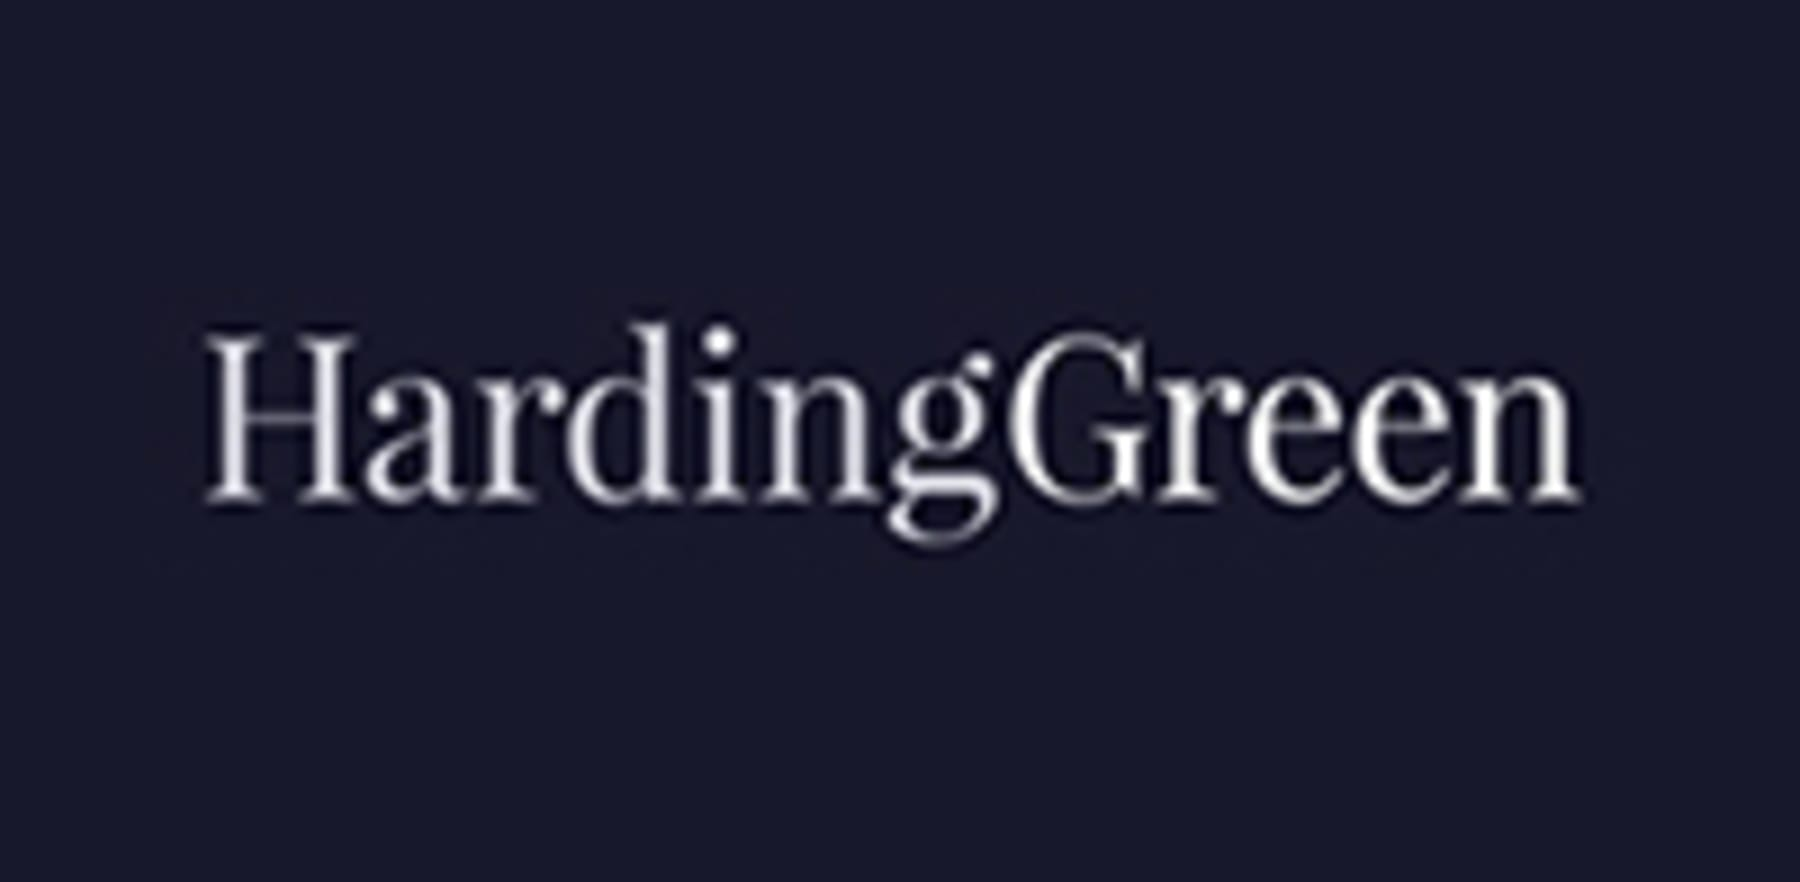 Harding Green